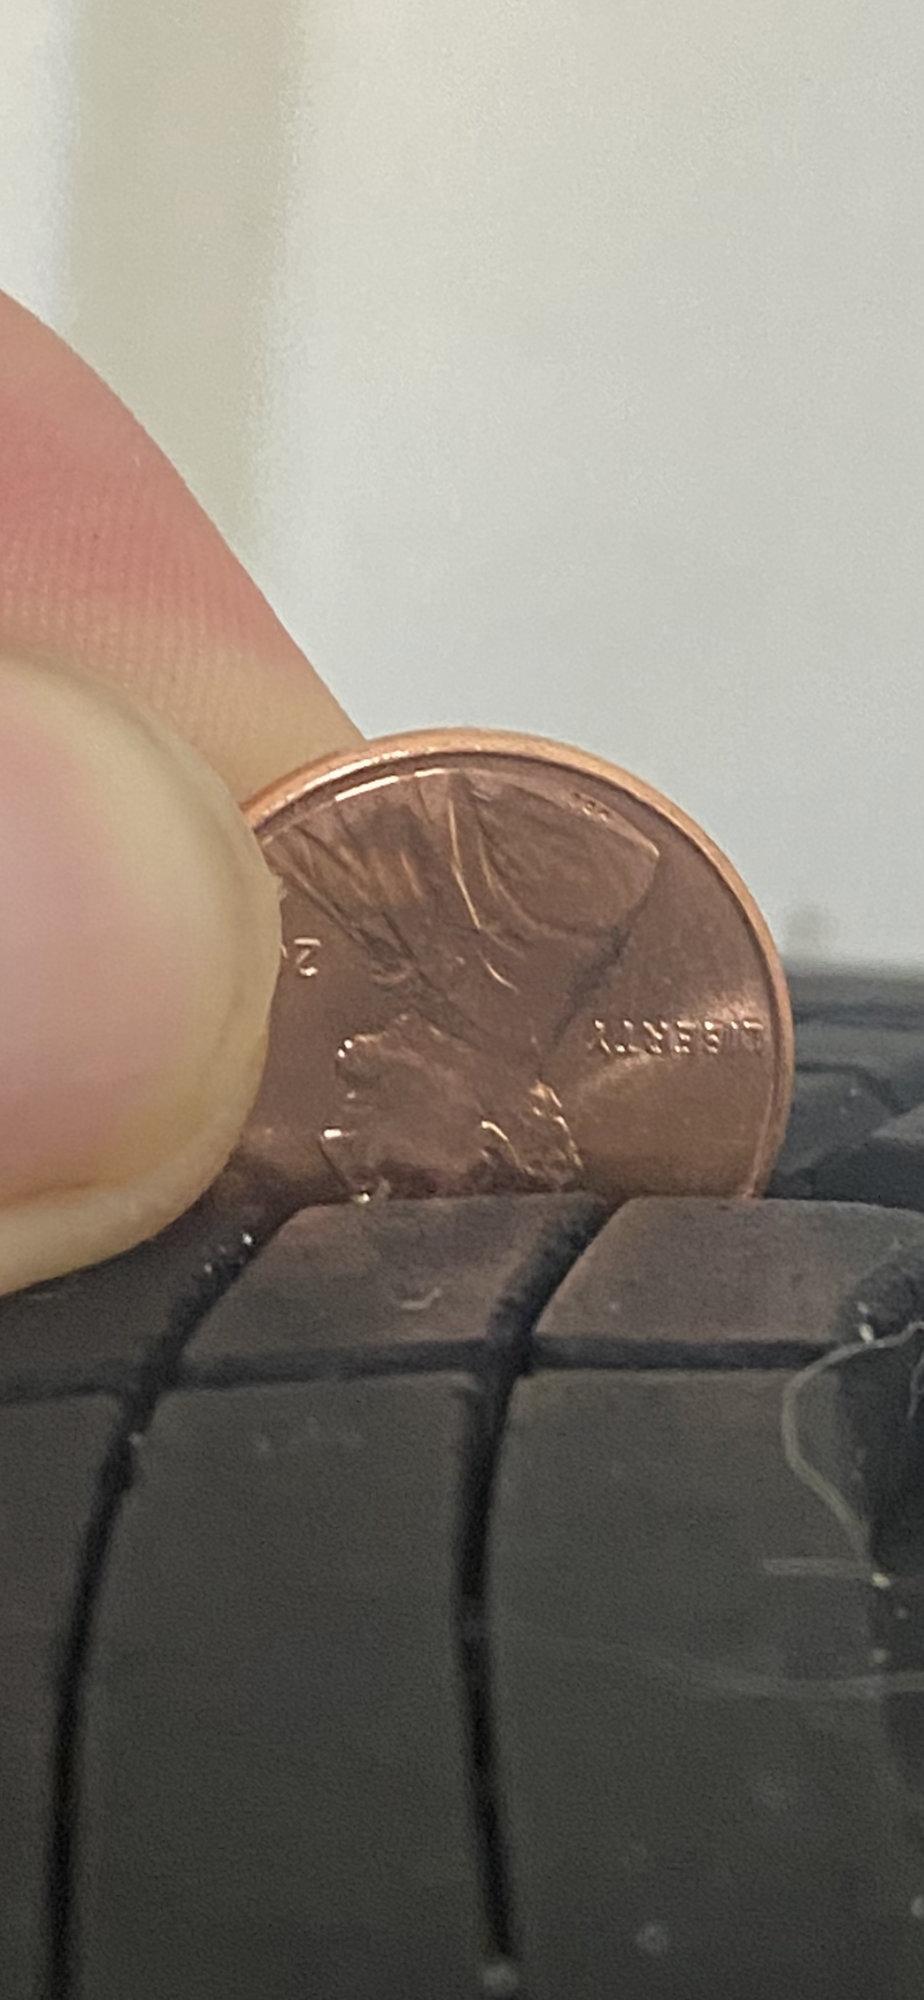 4 penny closeupIMG_2528 copy.jpg